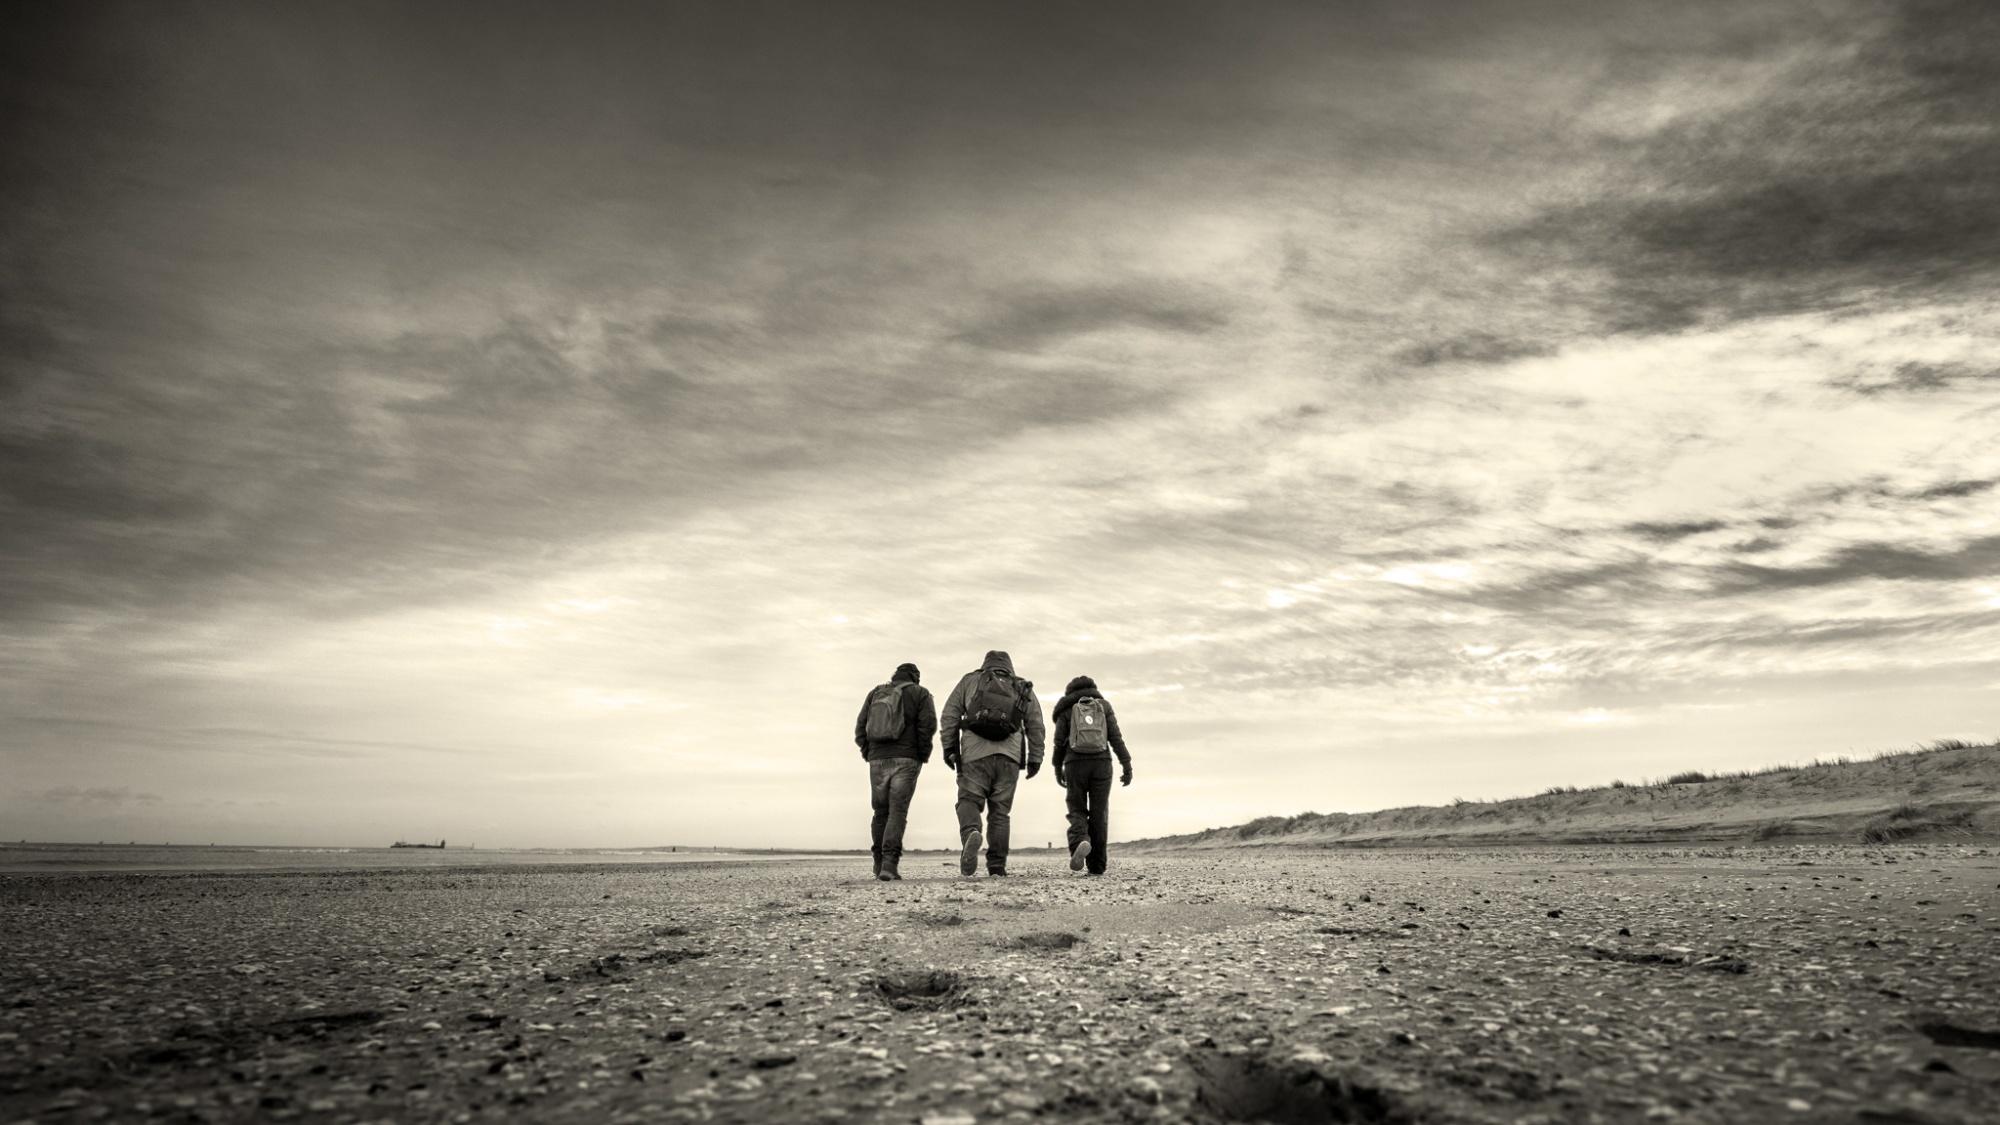 three people with backpacks walking towards horizon